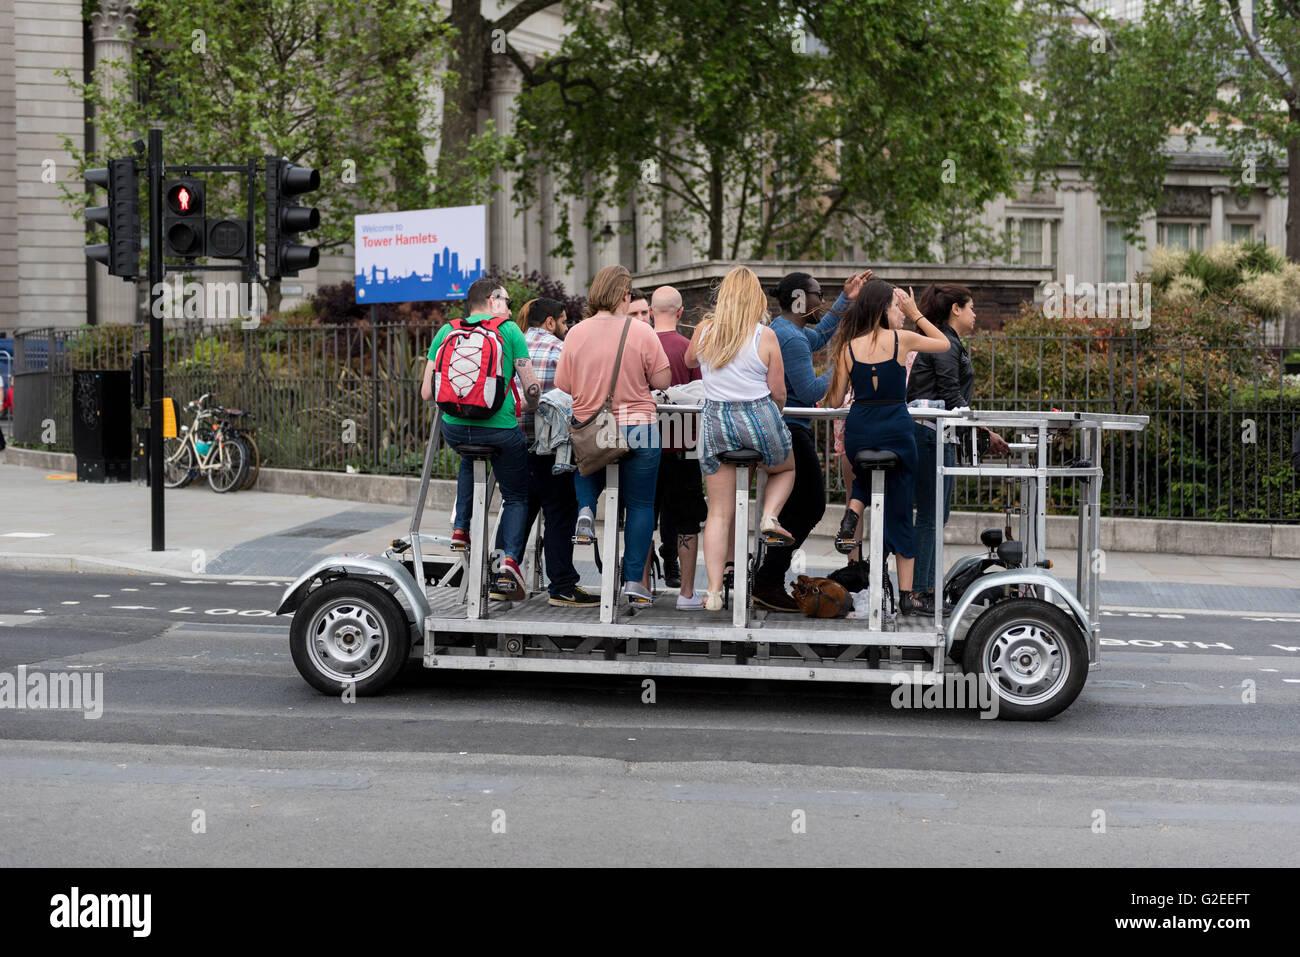 London, UK.  29 May 2016.  A slow moving, environmentally friendly vehicle, running on human pedal-power, passes - Stock Image